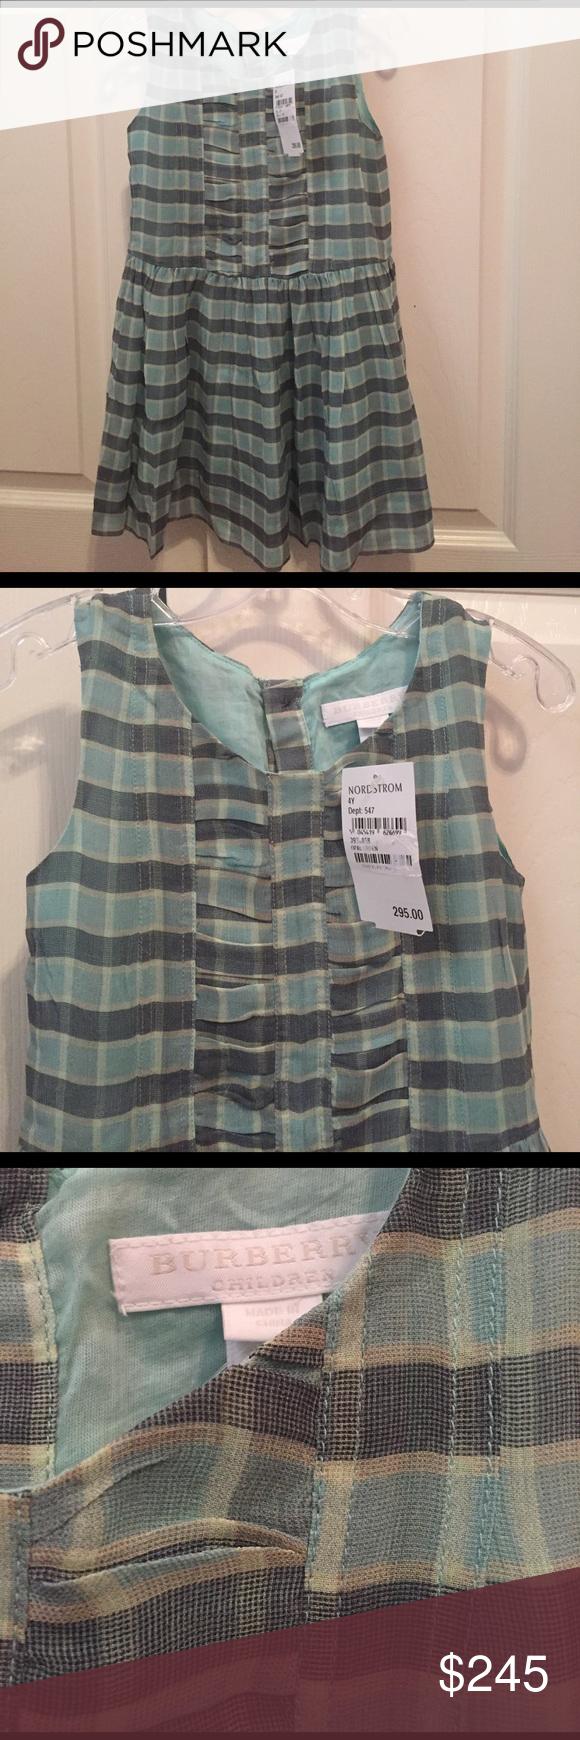 Beautiful blue new with tags burberry silk dress burberry dress